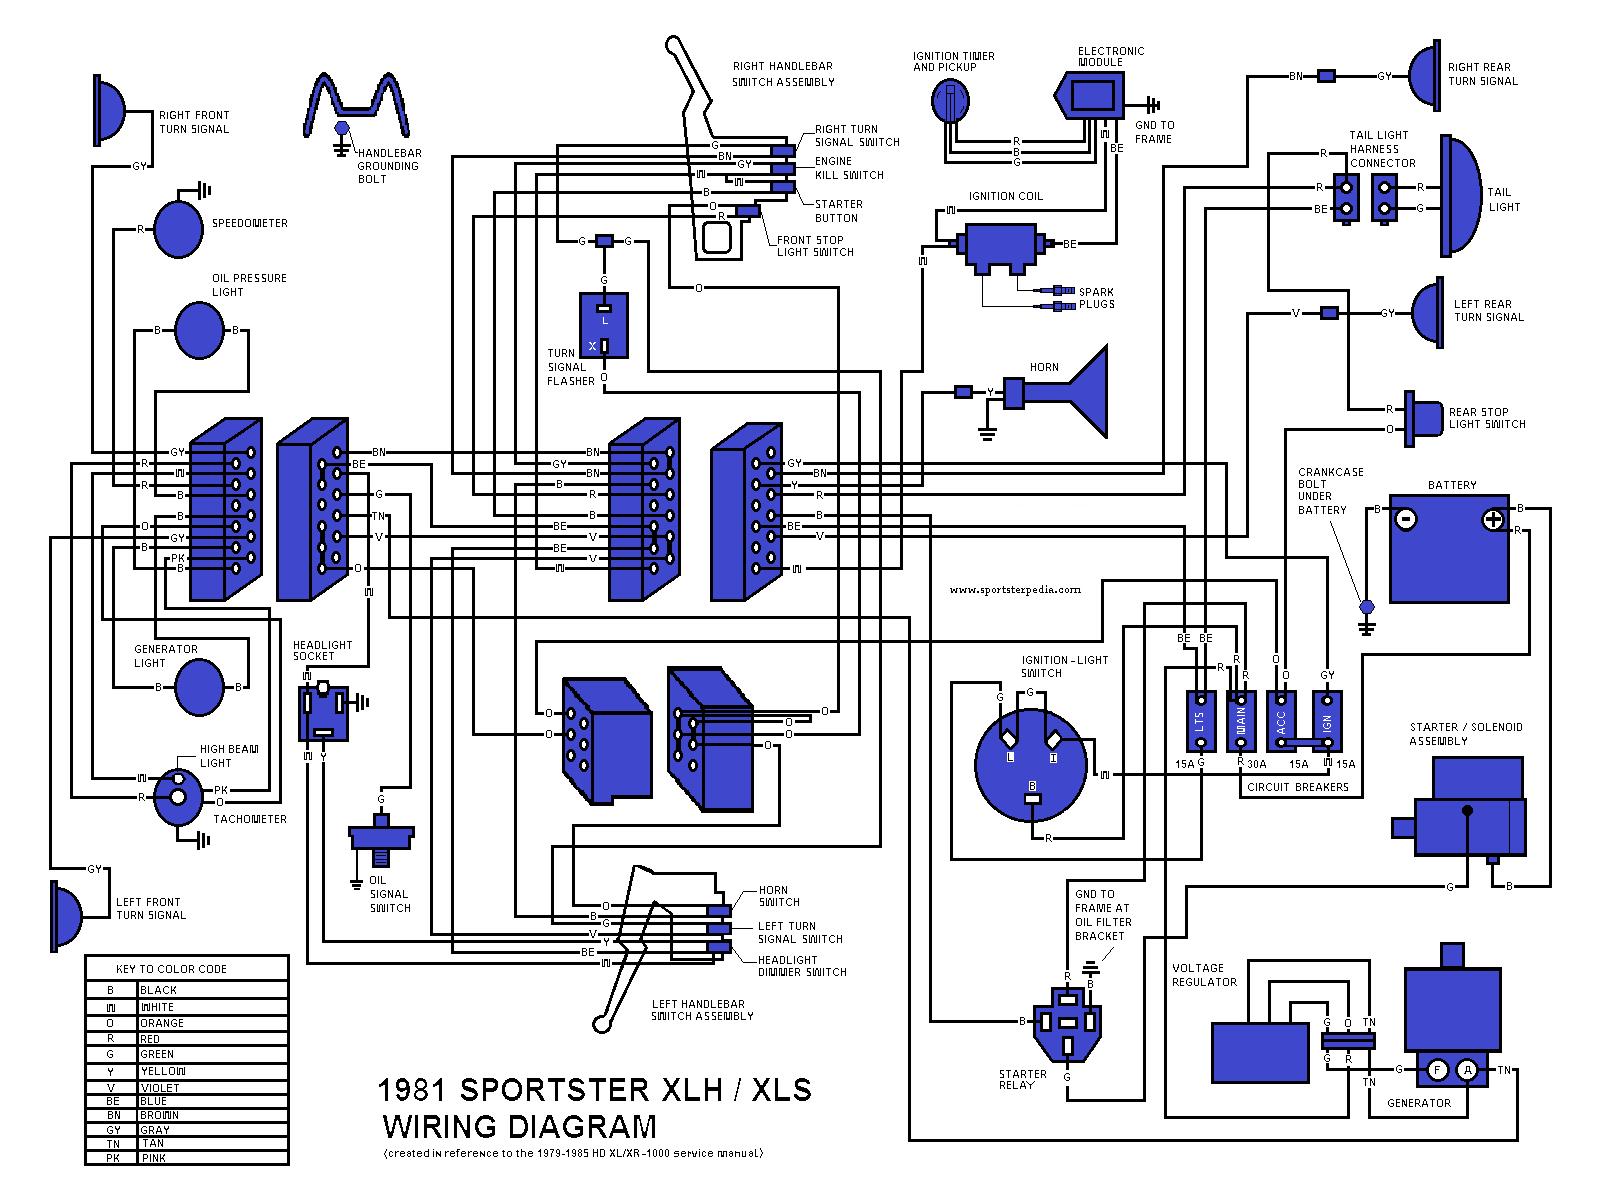 1982 Fx Wiring Diagram - Wiring Diagram